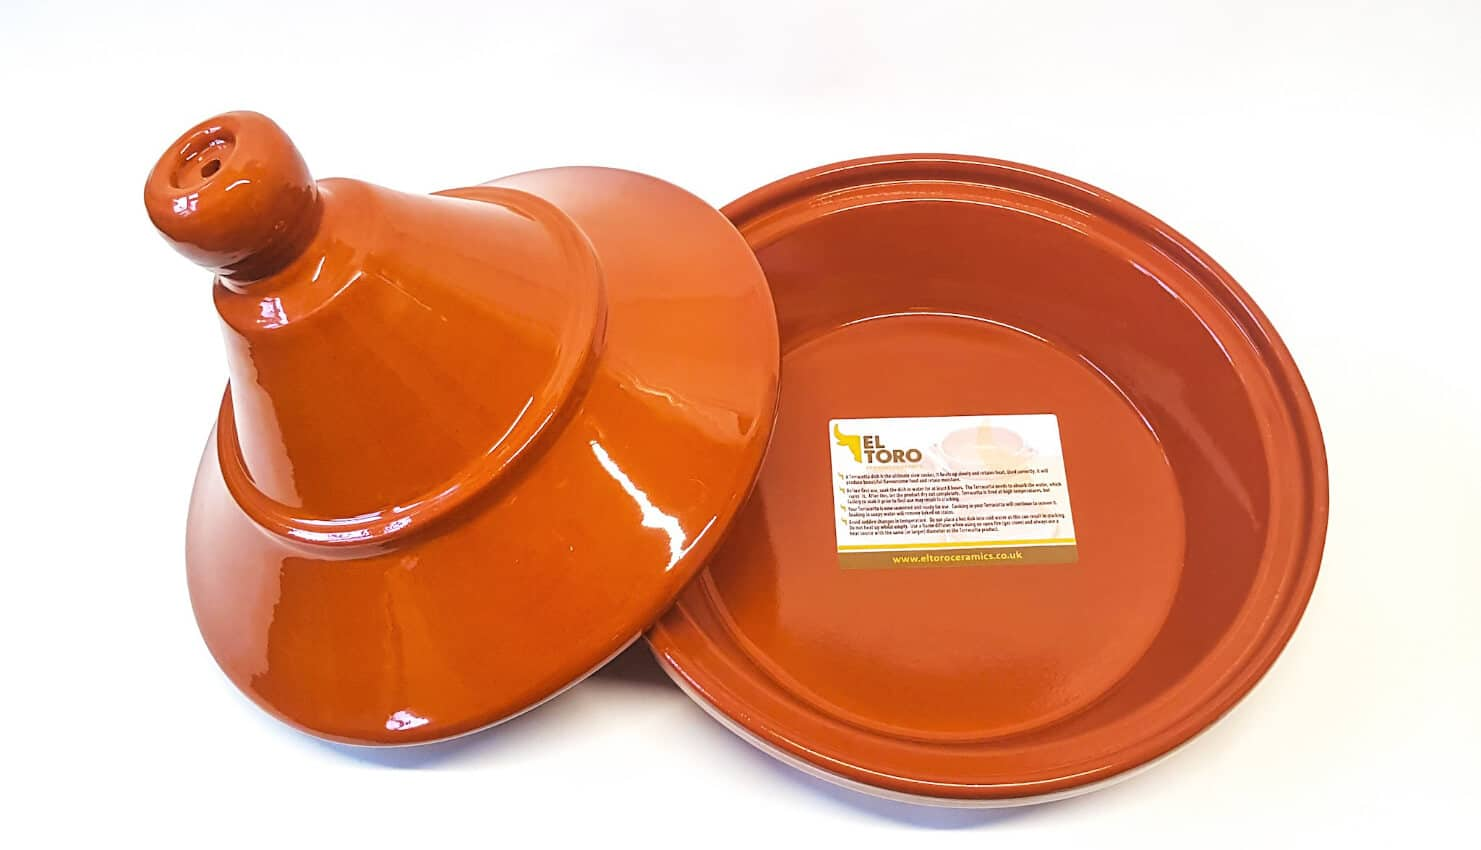 Verano-Spanish-Ceramics-El-Toro-Collection-Tagine-3